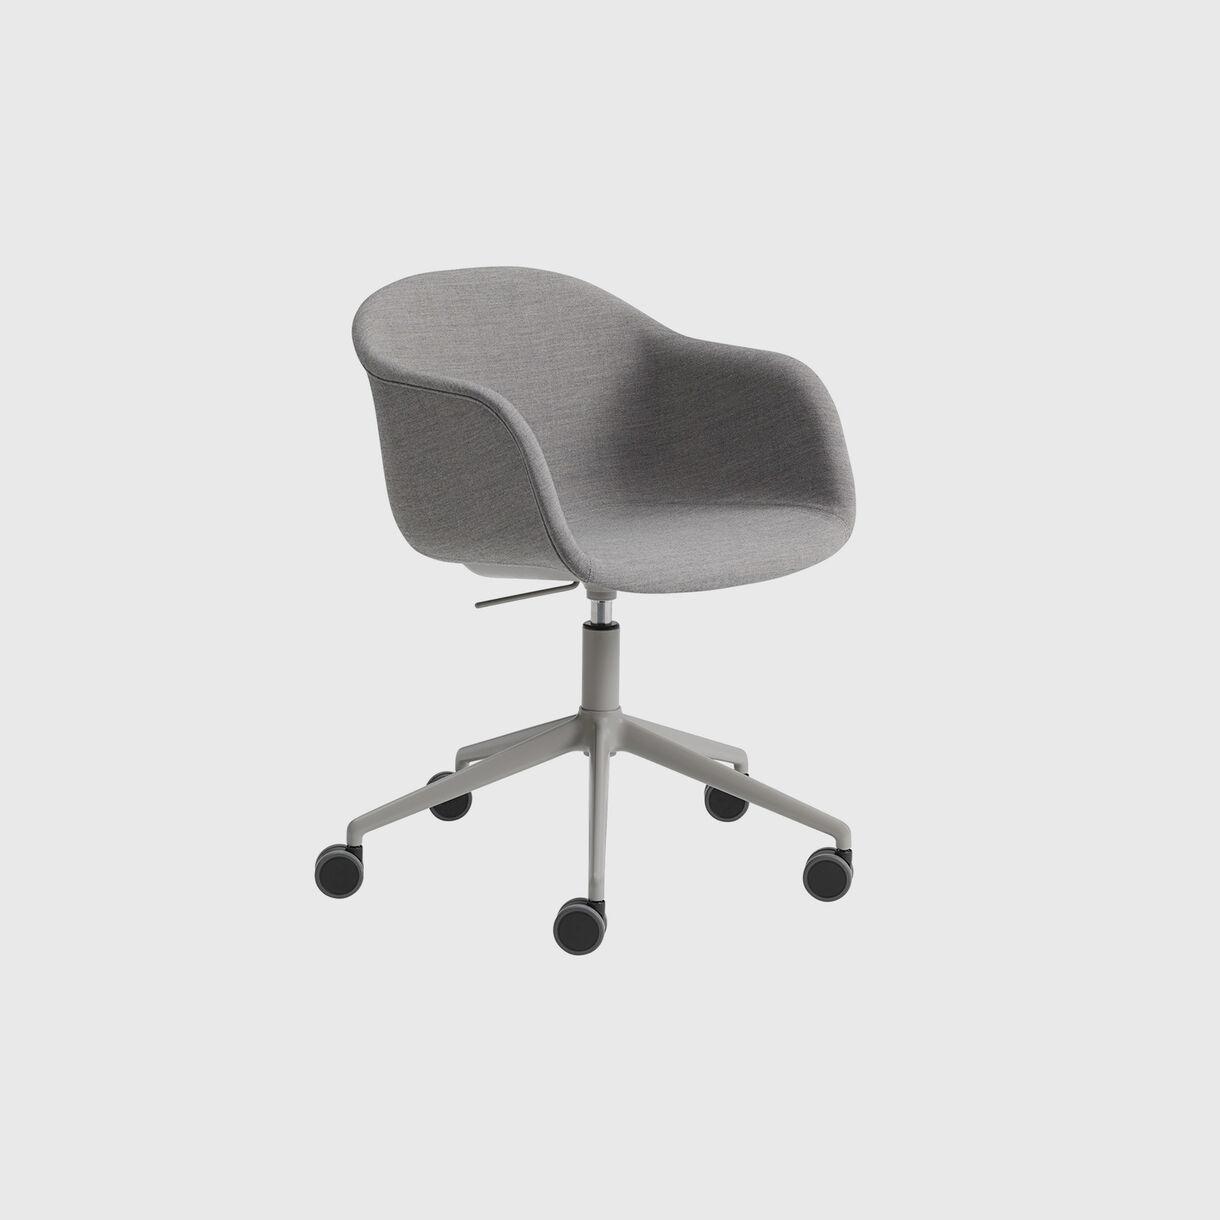 Fiber Armchair Upholstered, Remix 133 & Grey, Swivel Base with Castors & Gas Lift, Grey